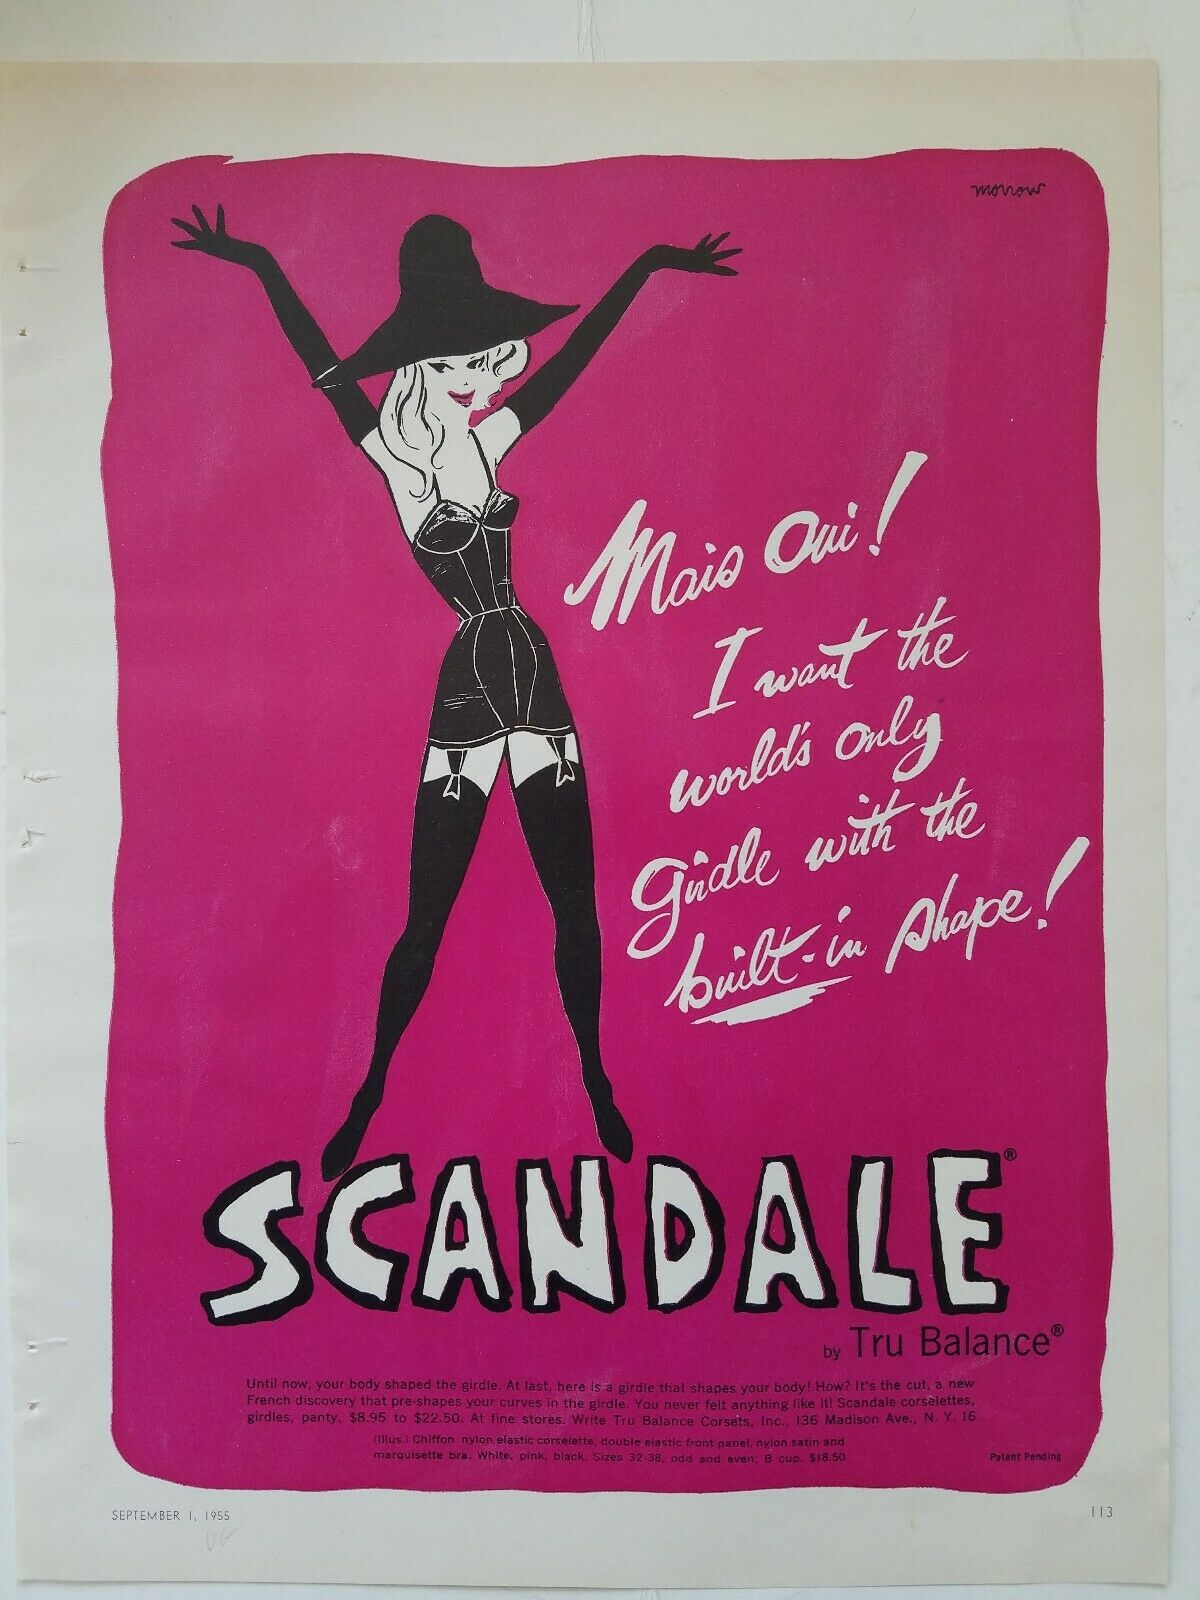 Scandale 1955 US Morrow tru-balance A1